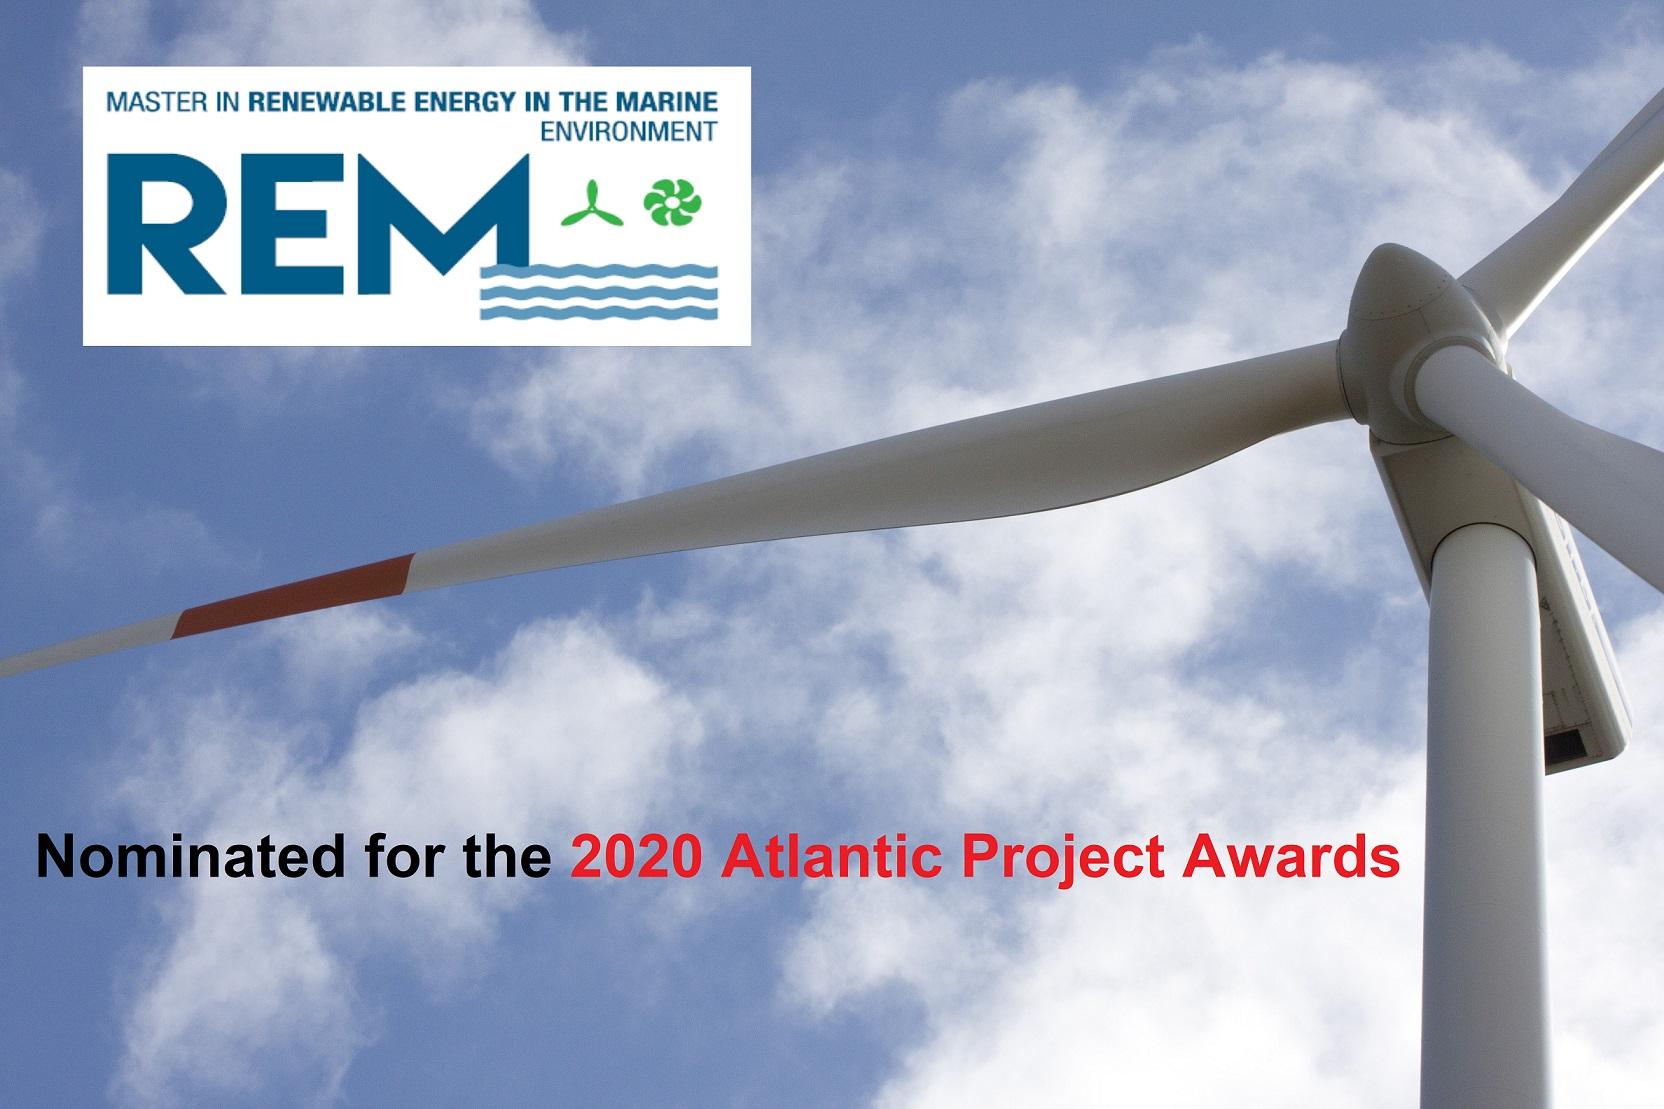 atlantic project awards rem